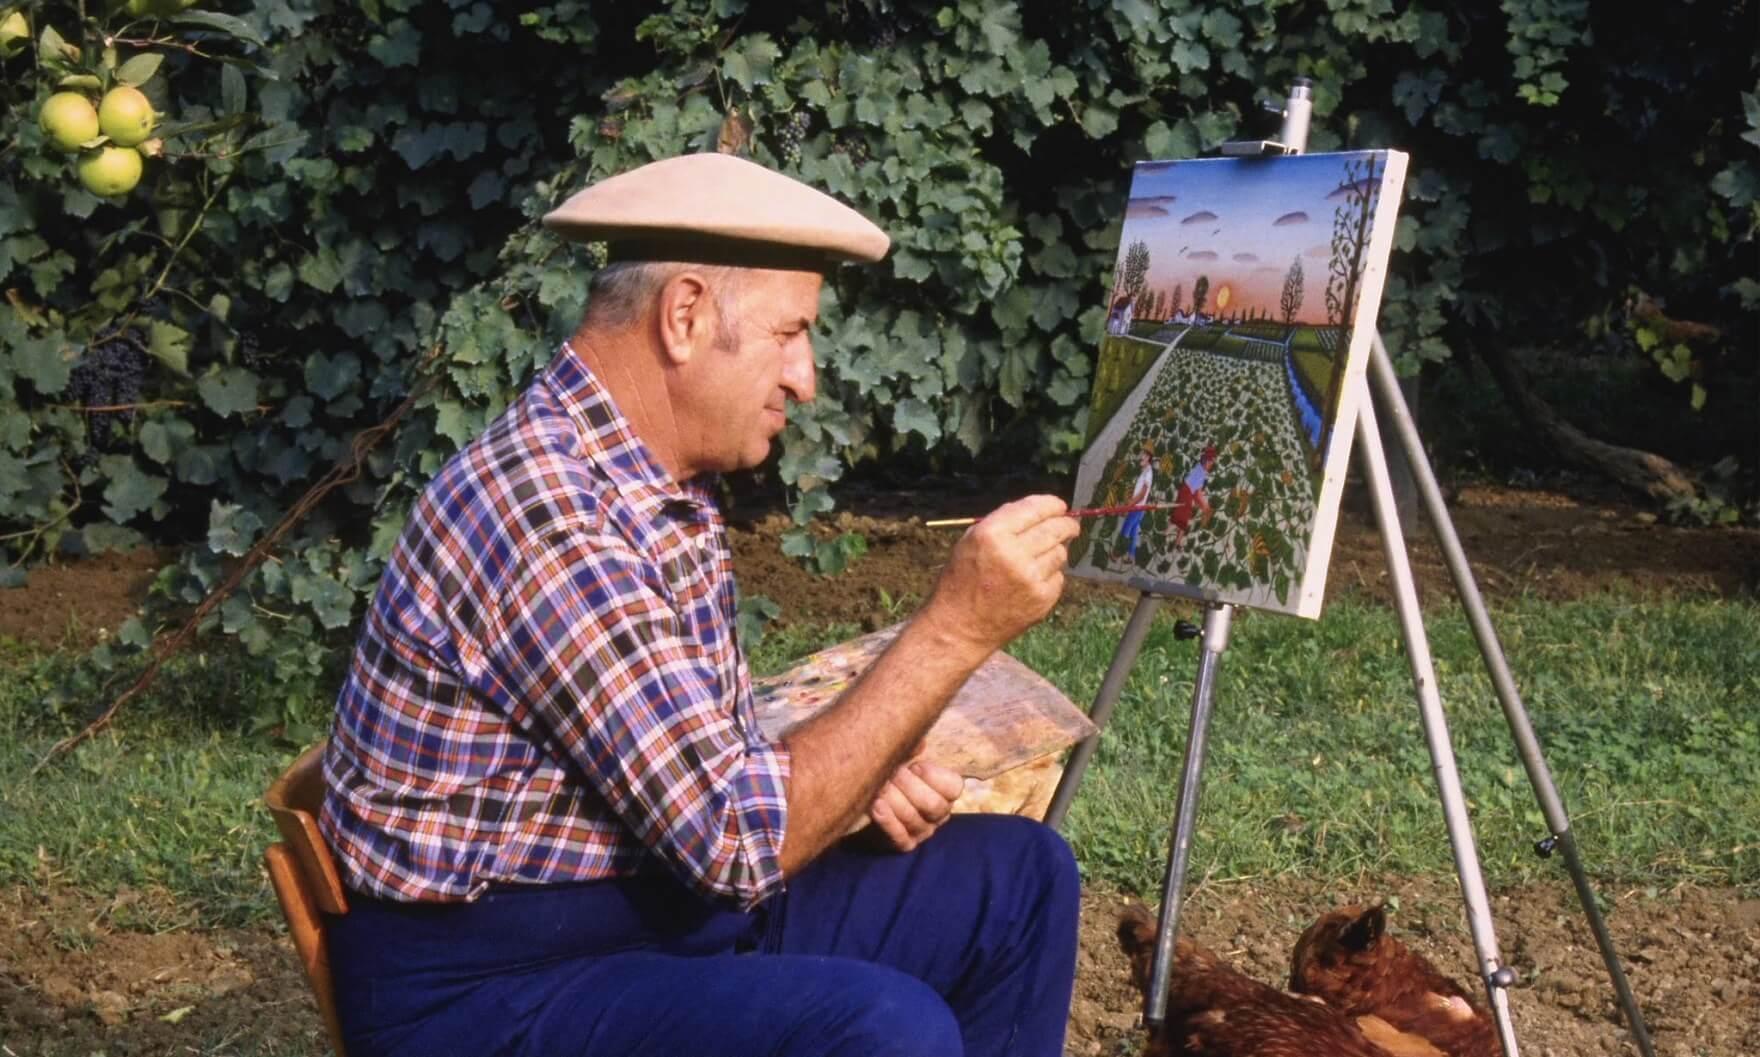 Man Painting in Garden